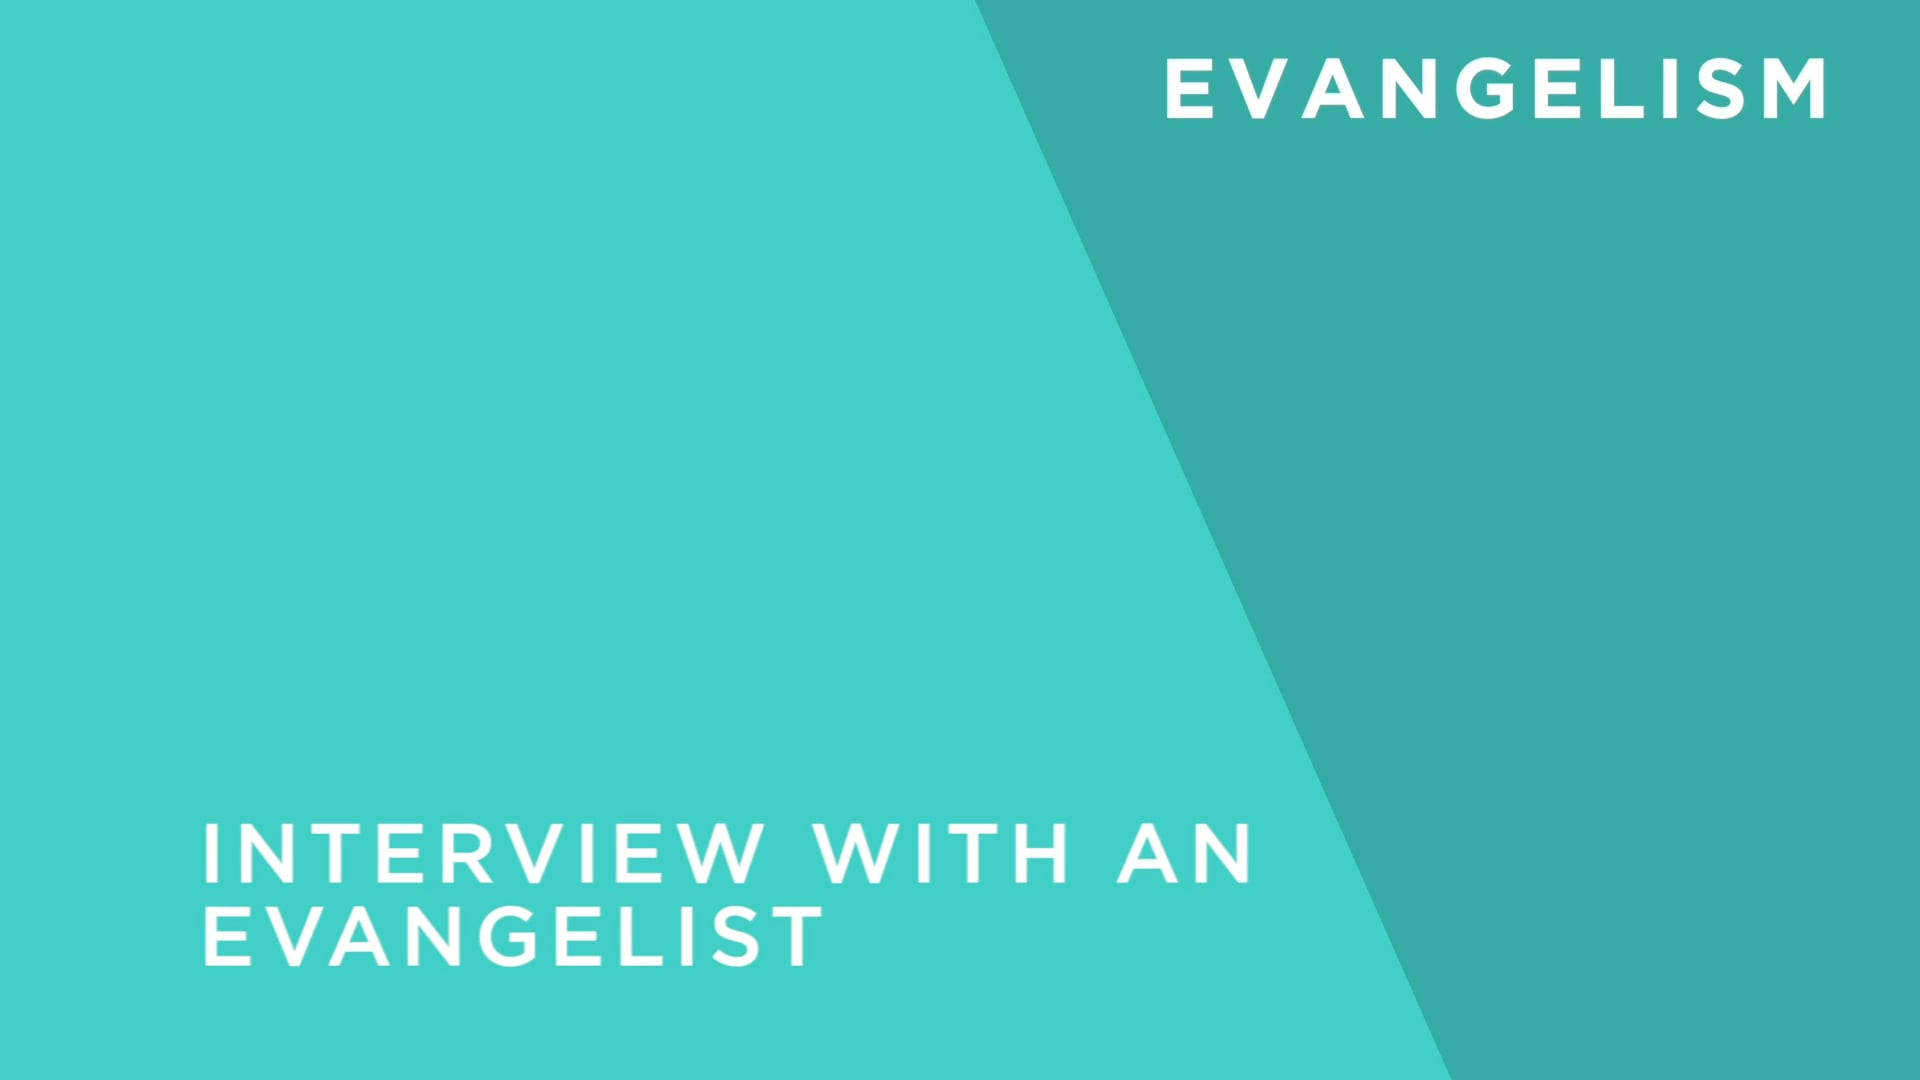 Interview With an Evangelist